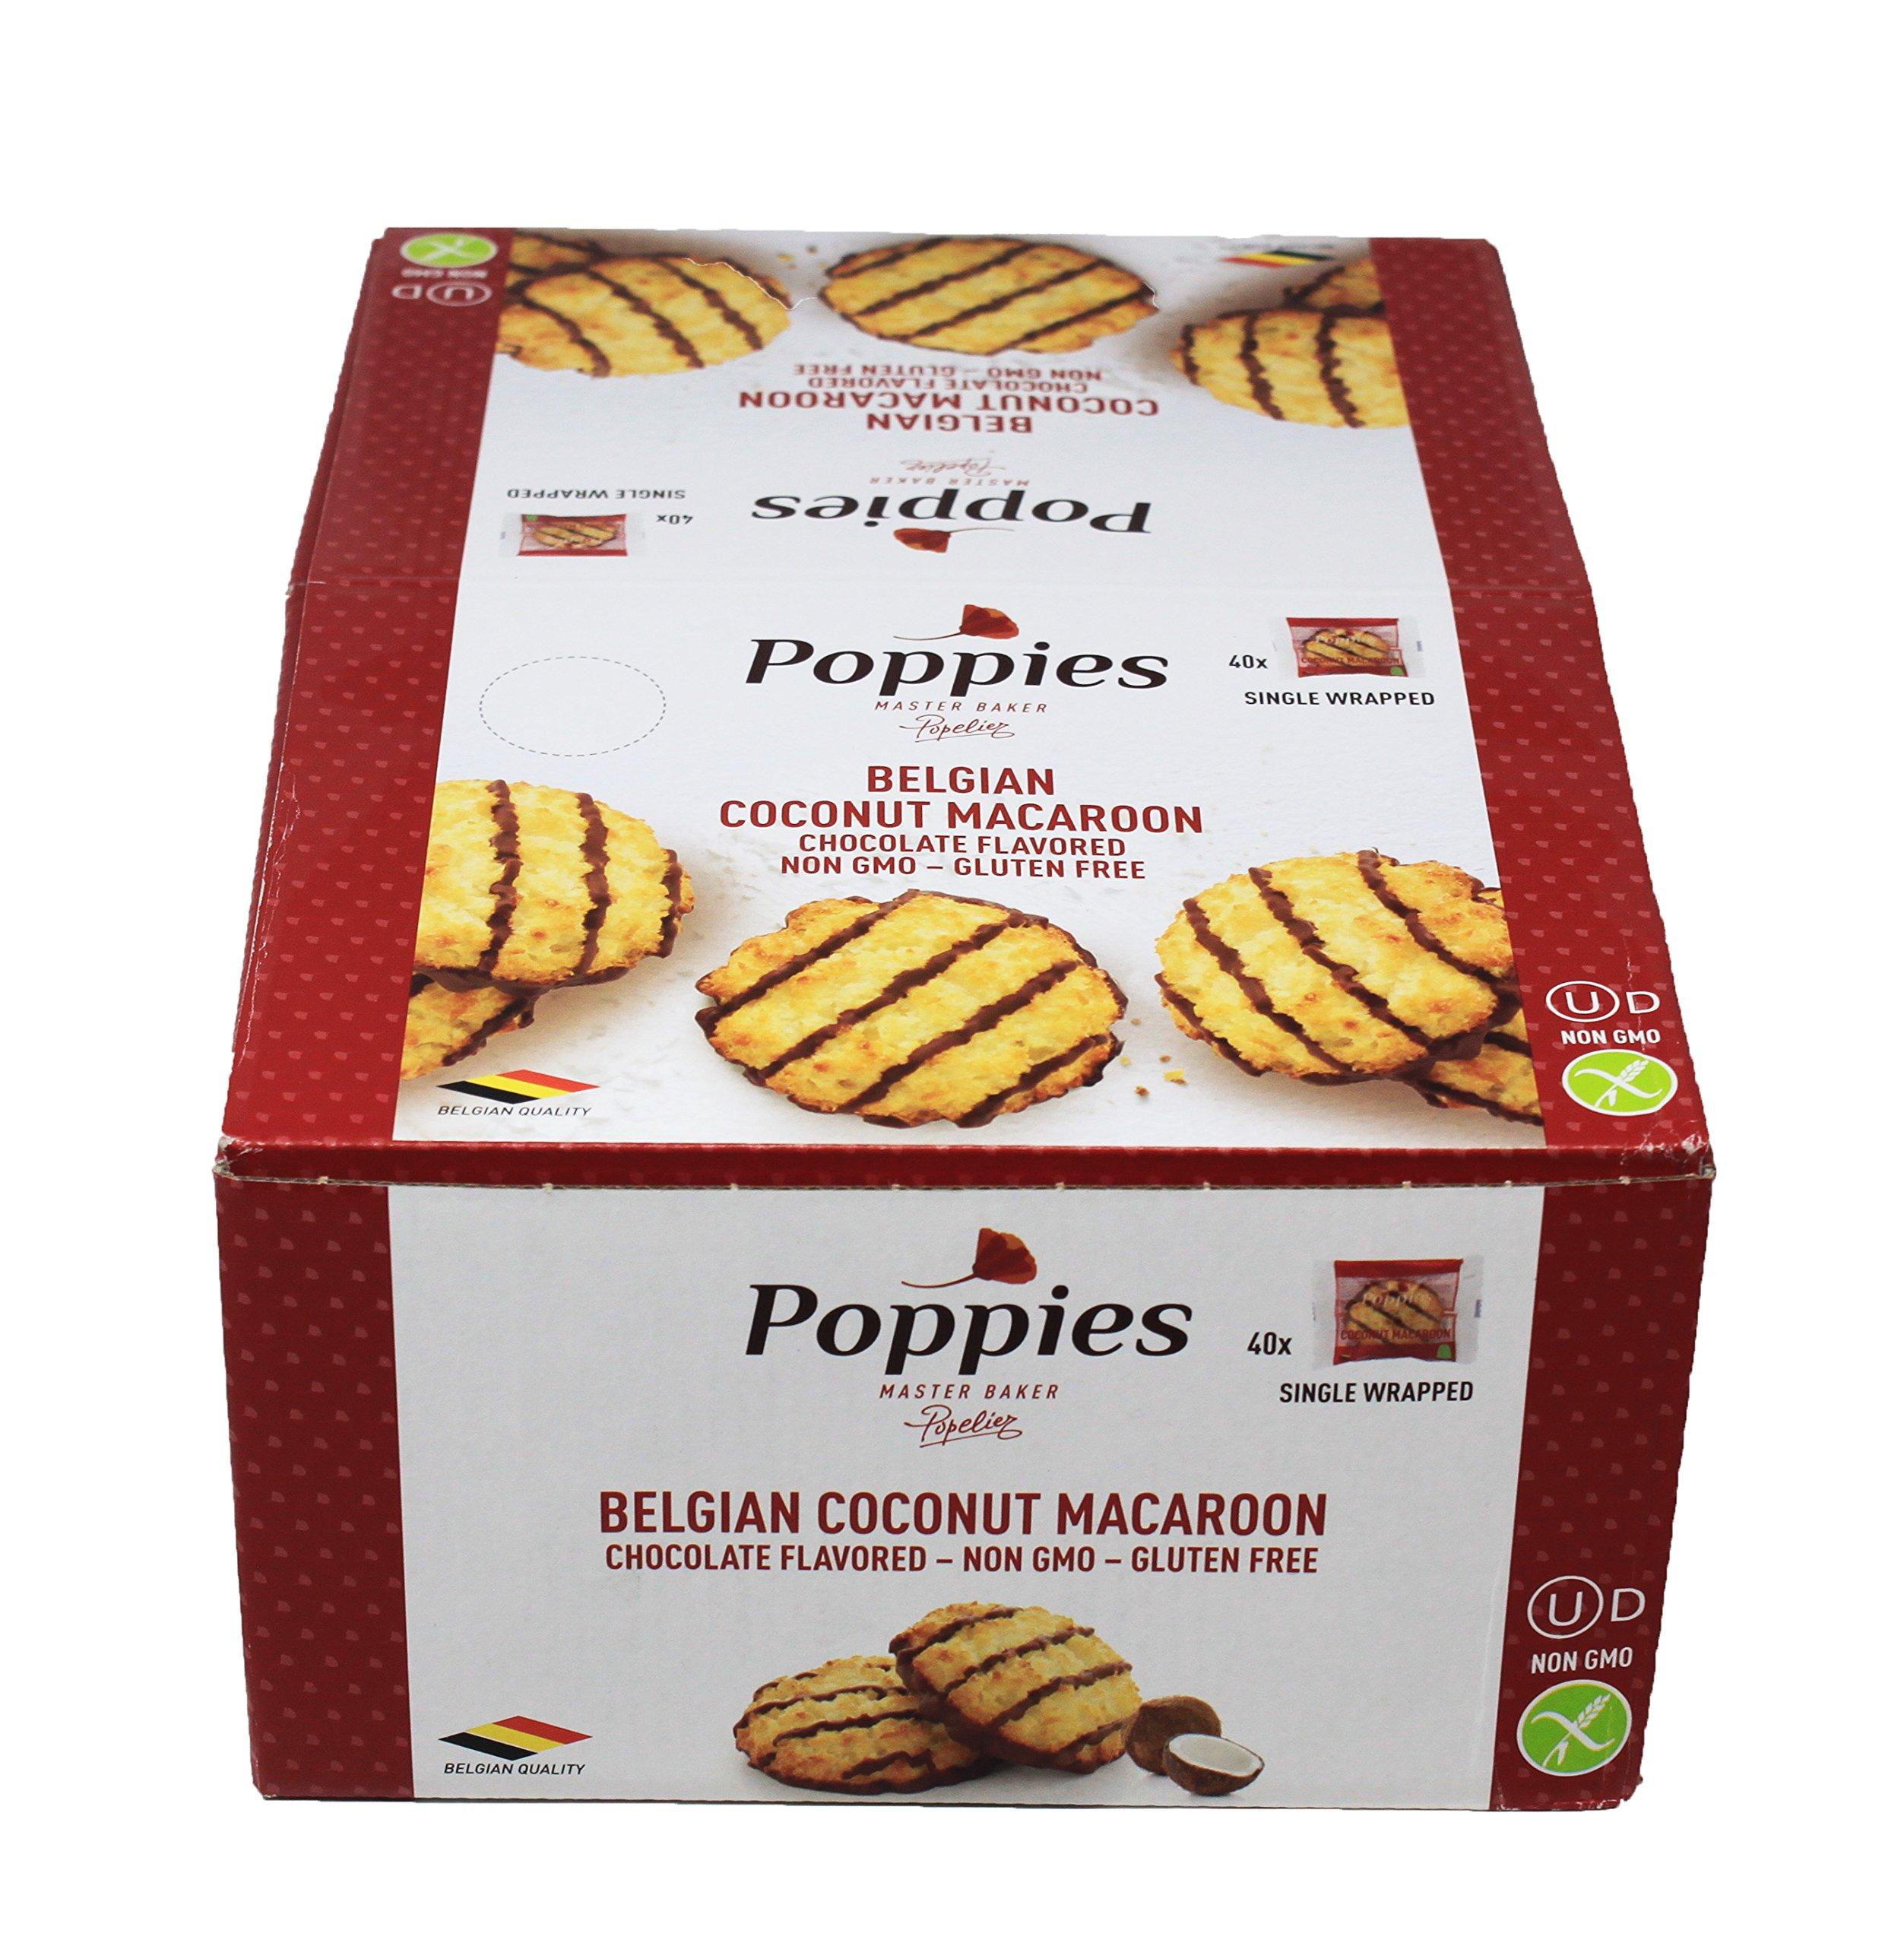 Poppies Belgium Coconut Macaroon Single Serve Cookies | 40CT Box | Non-GMO, Gluten Free by Poppies